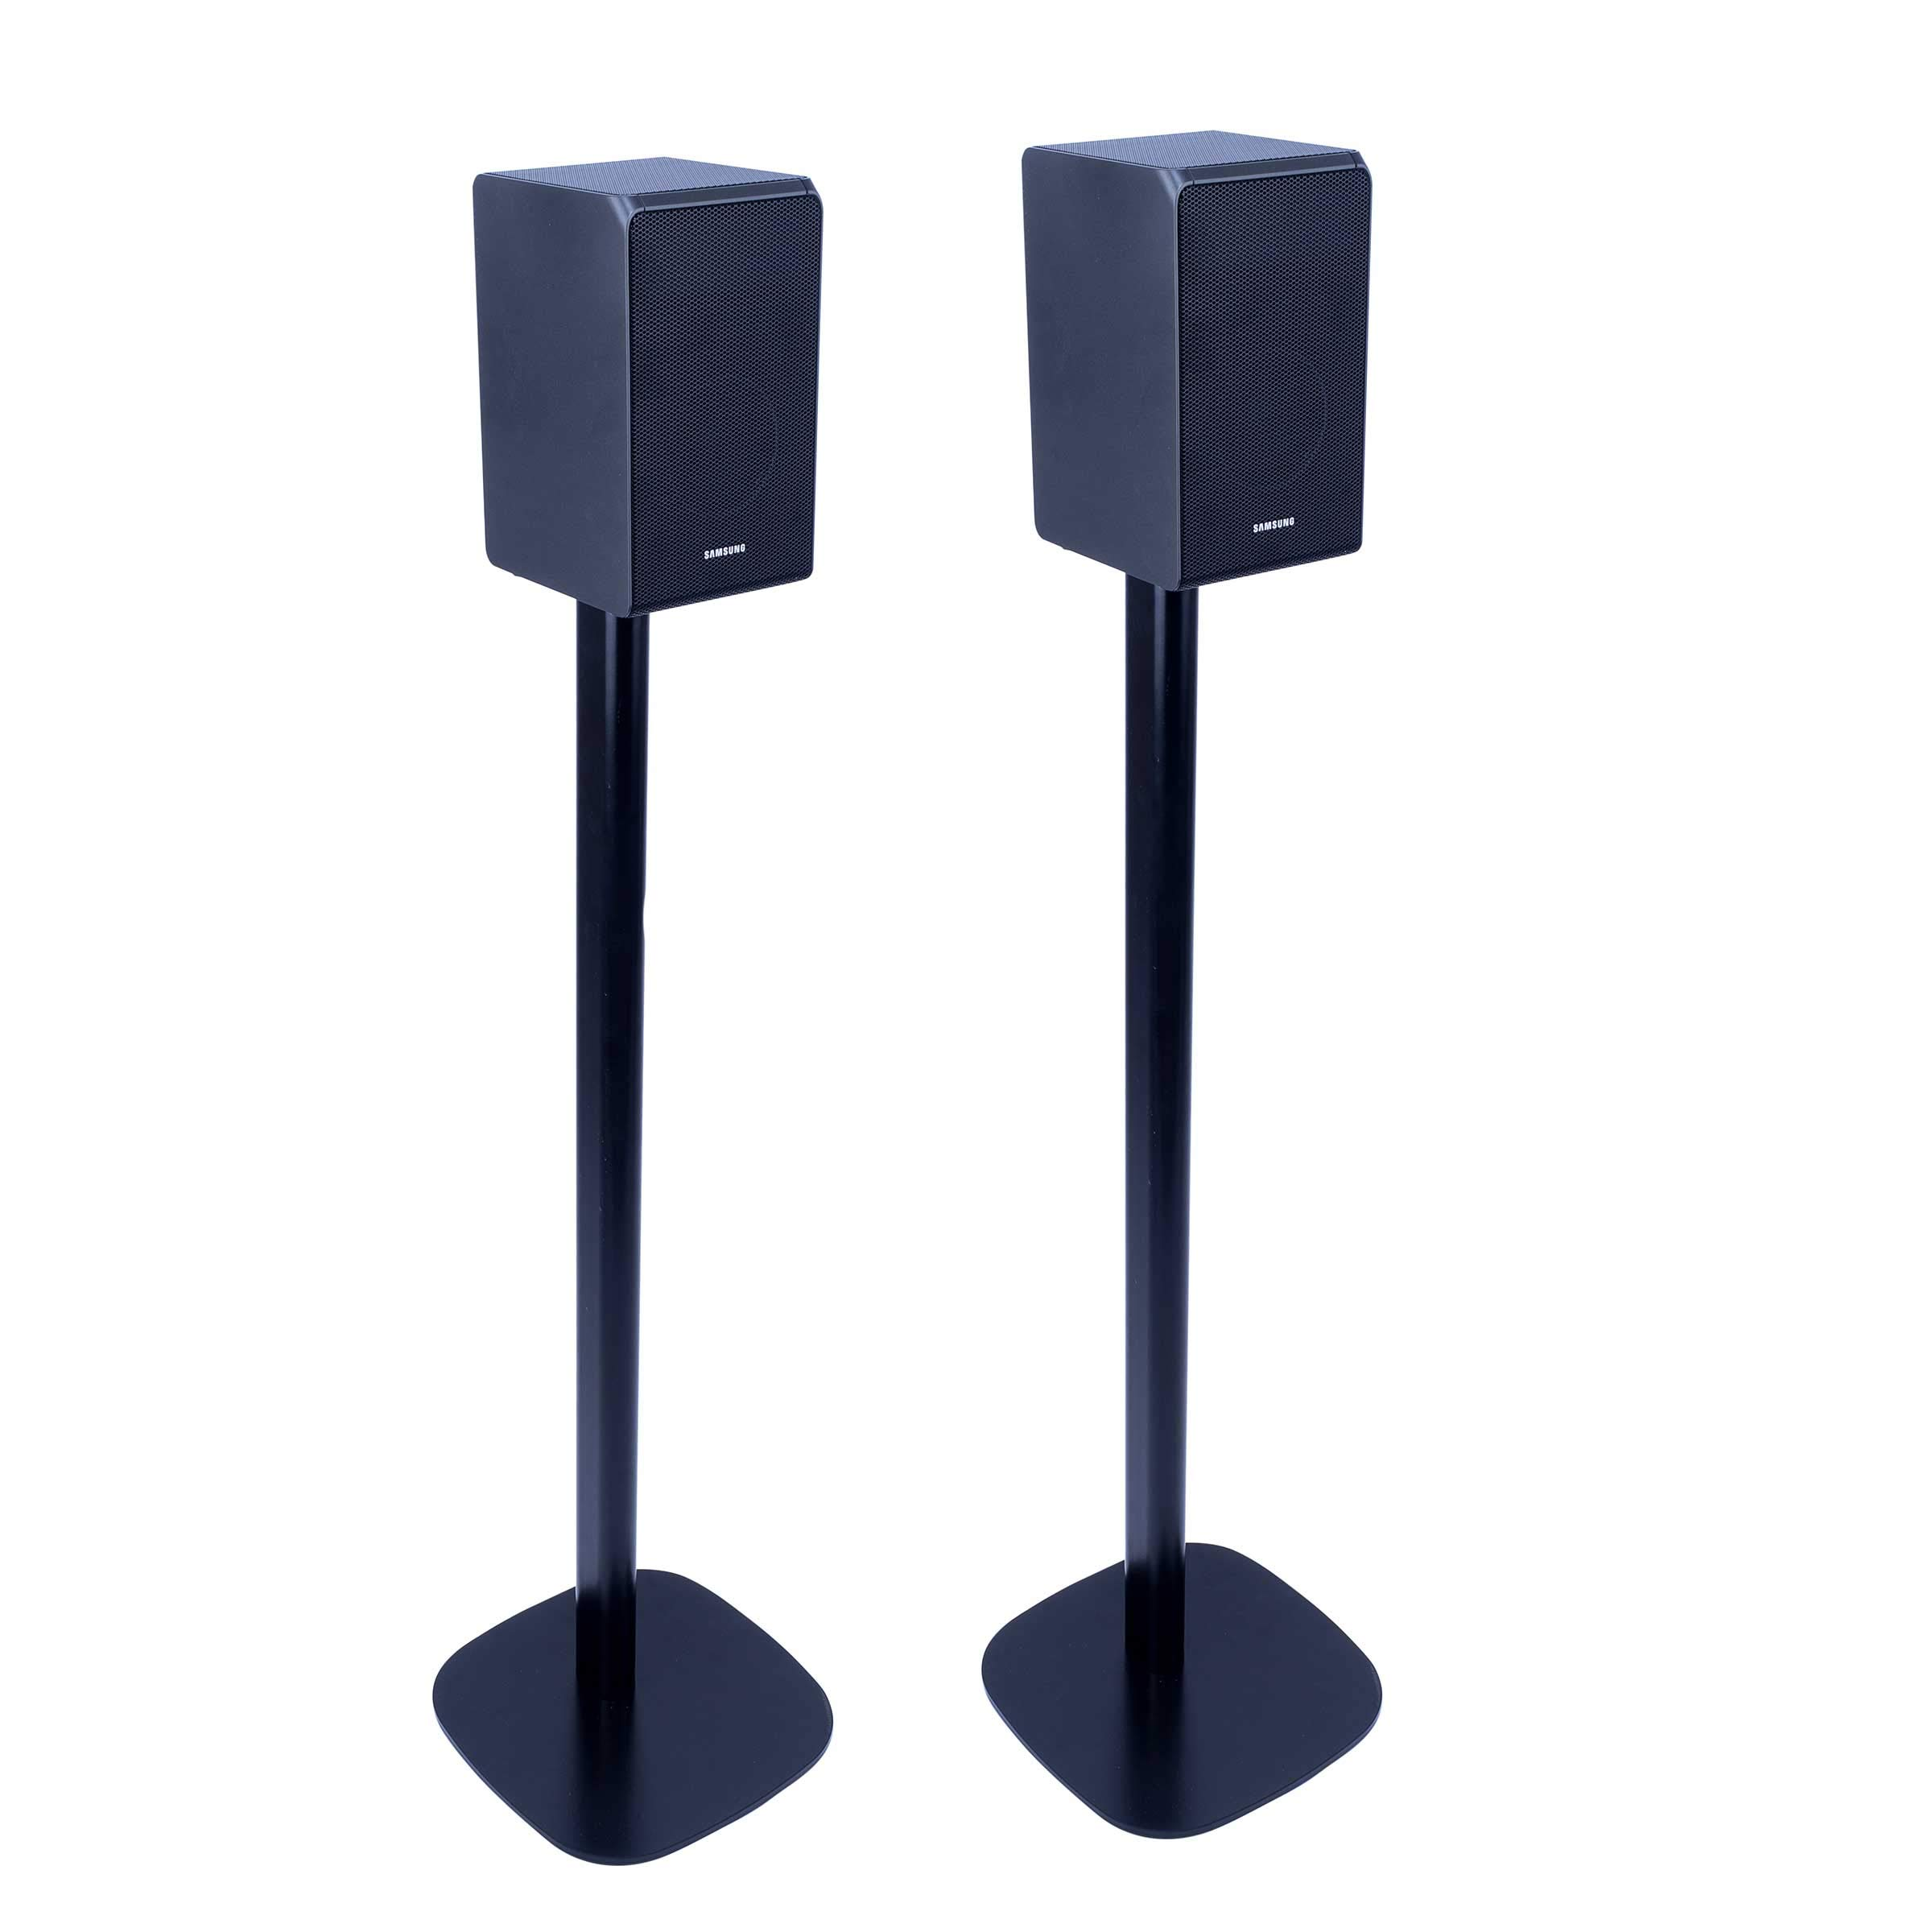 Vebos Floor Stand HW-Q950T Black Set - Compatible with Samsung HW-Q90R, Samsung HW-N950 and Samsung HW-K950